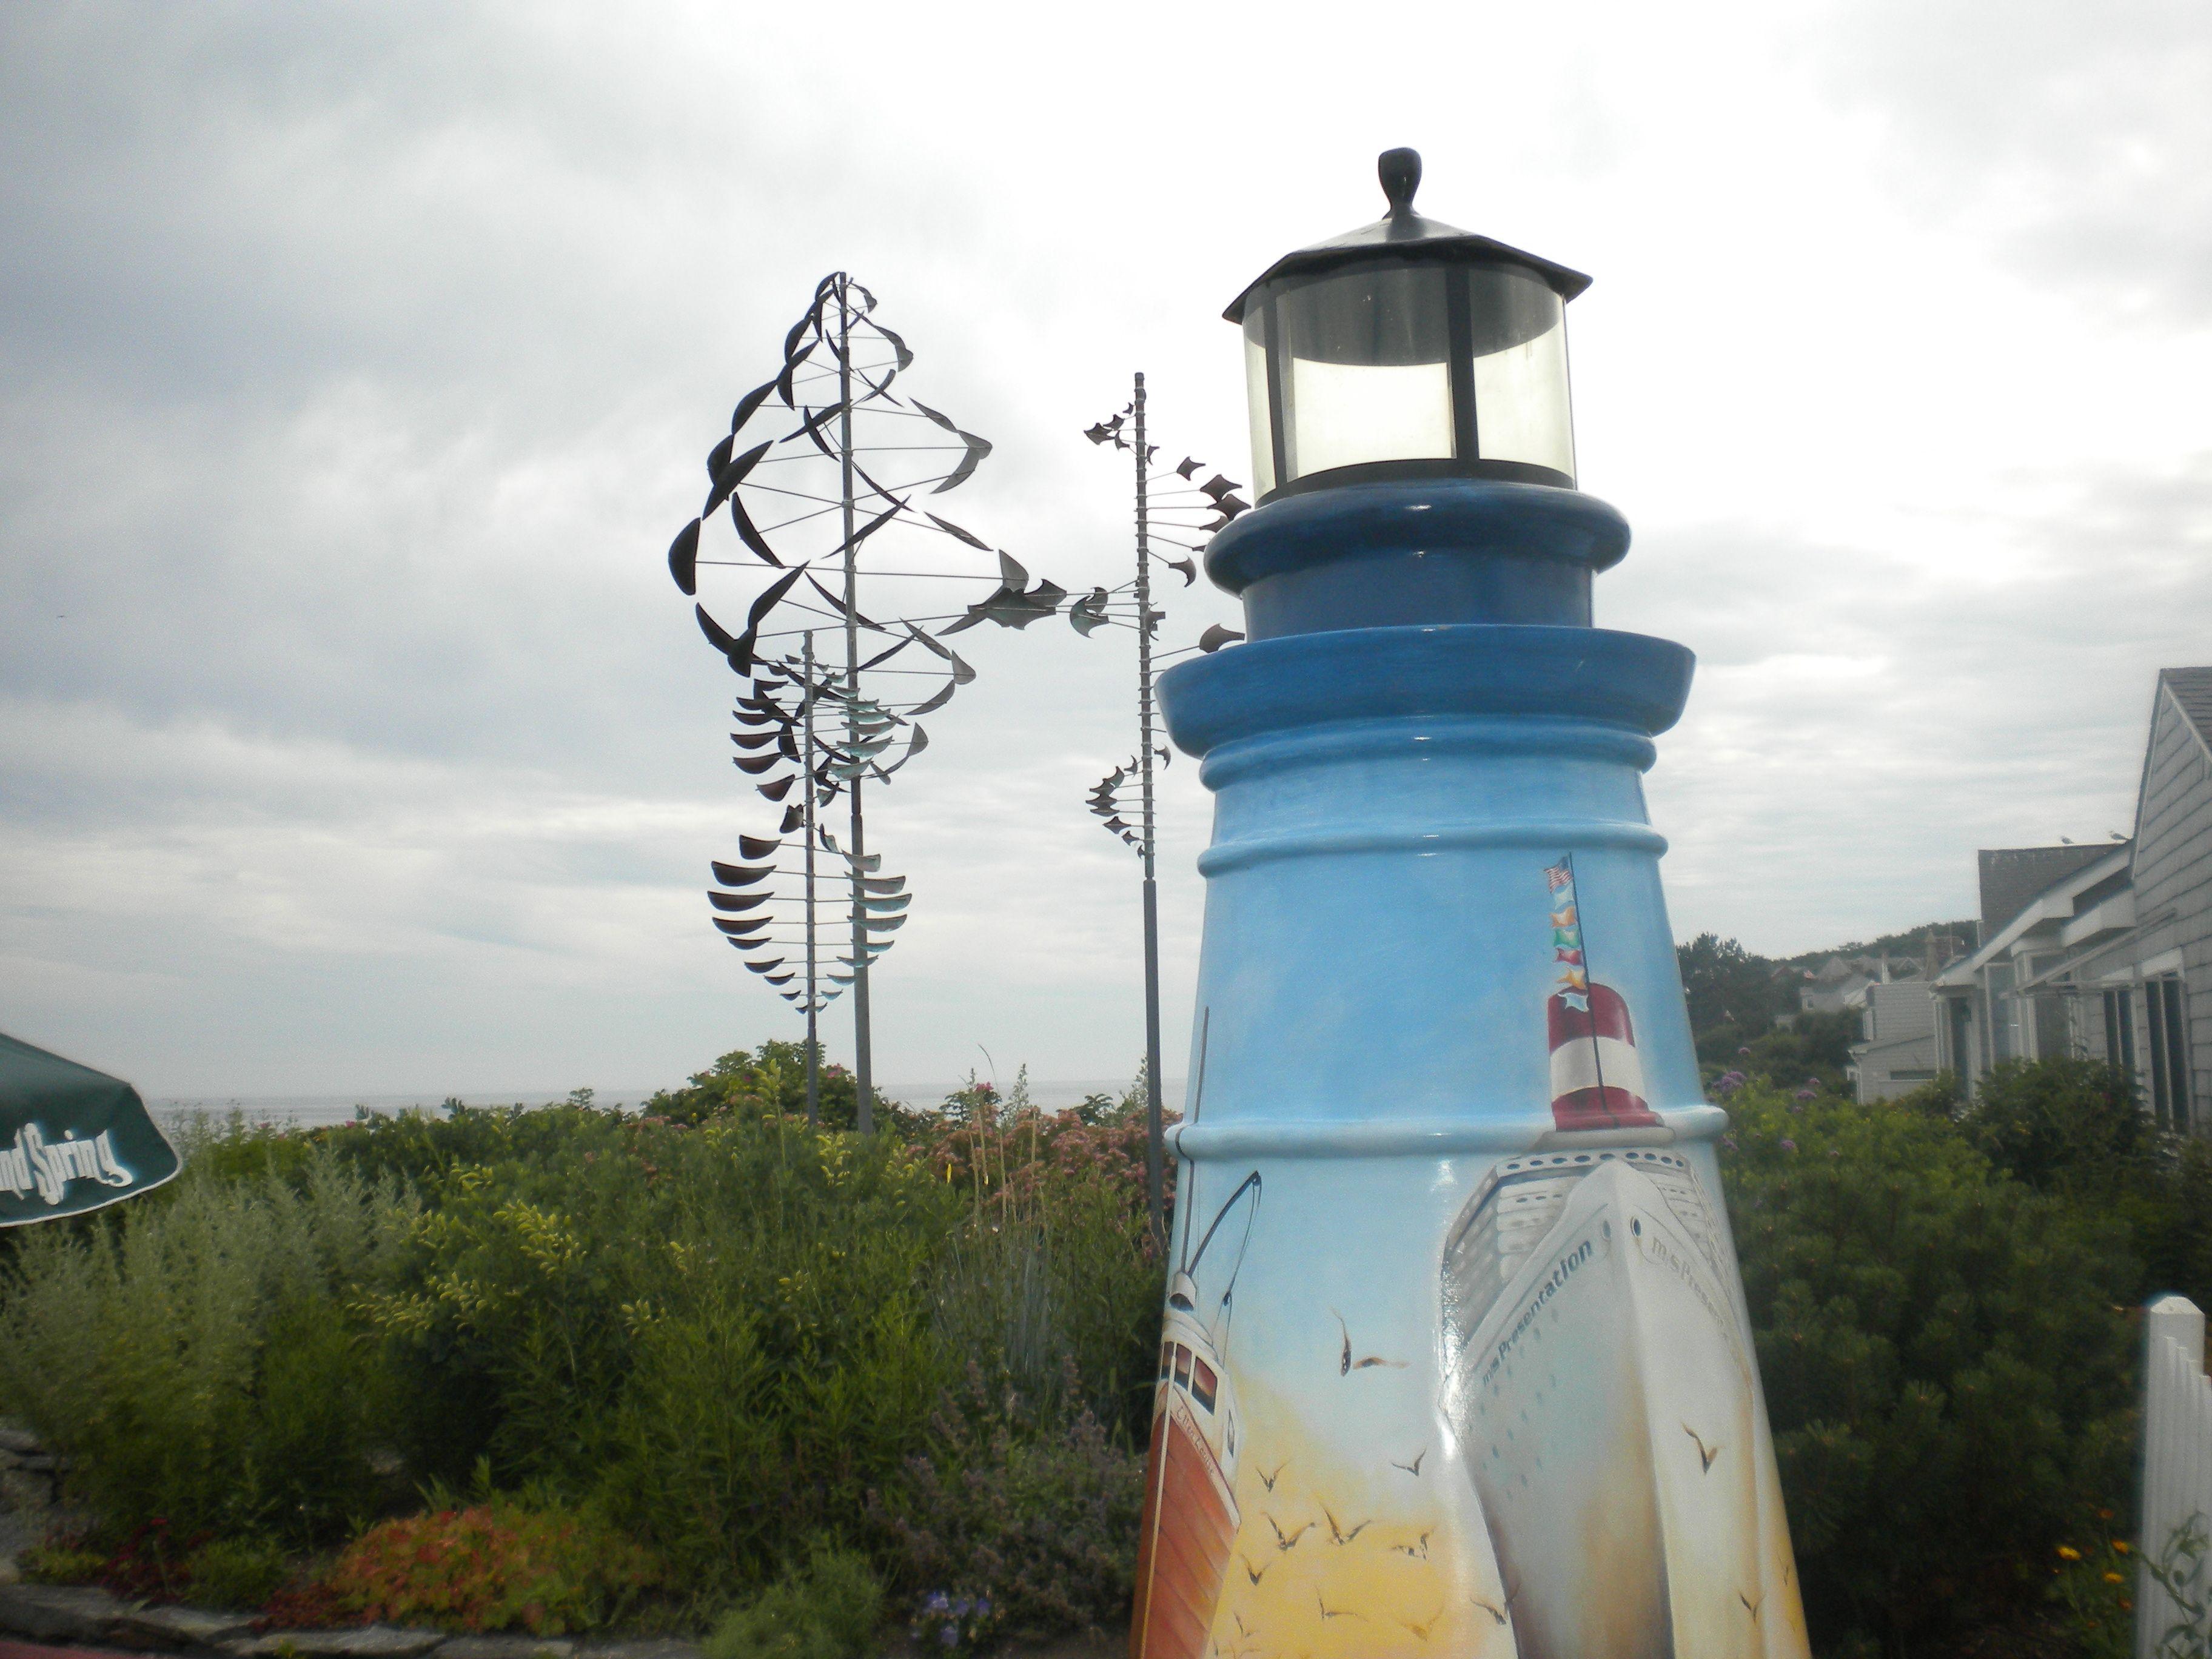 Pin by Israel Ferre on Light house - Portland Maine | Pinterest ...